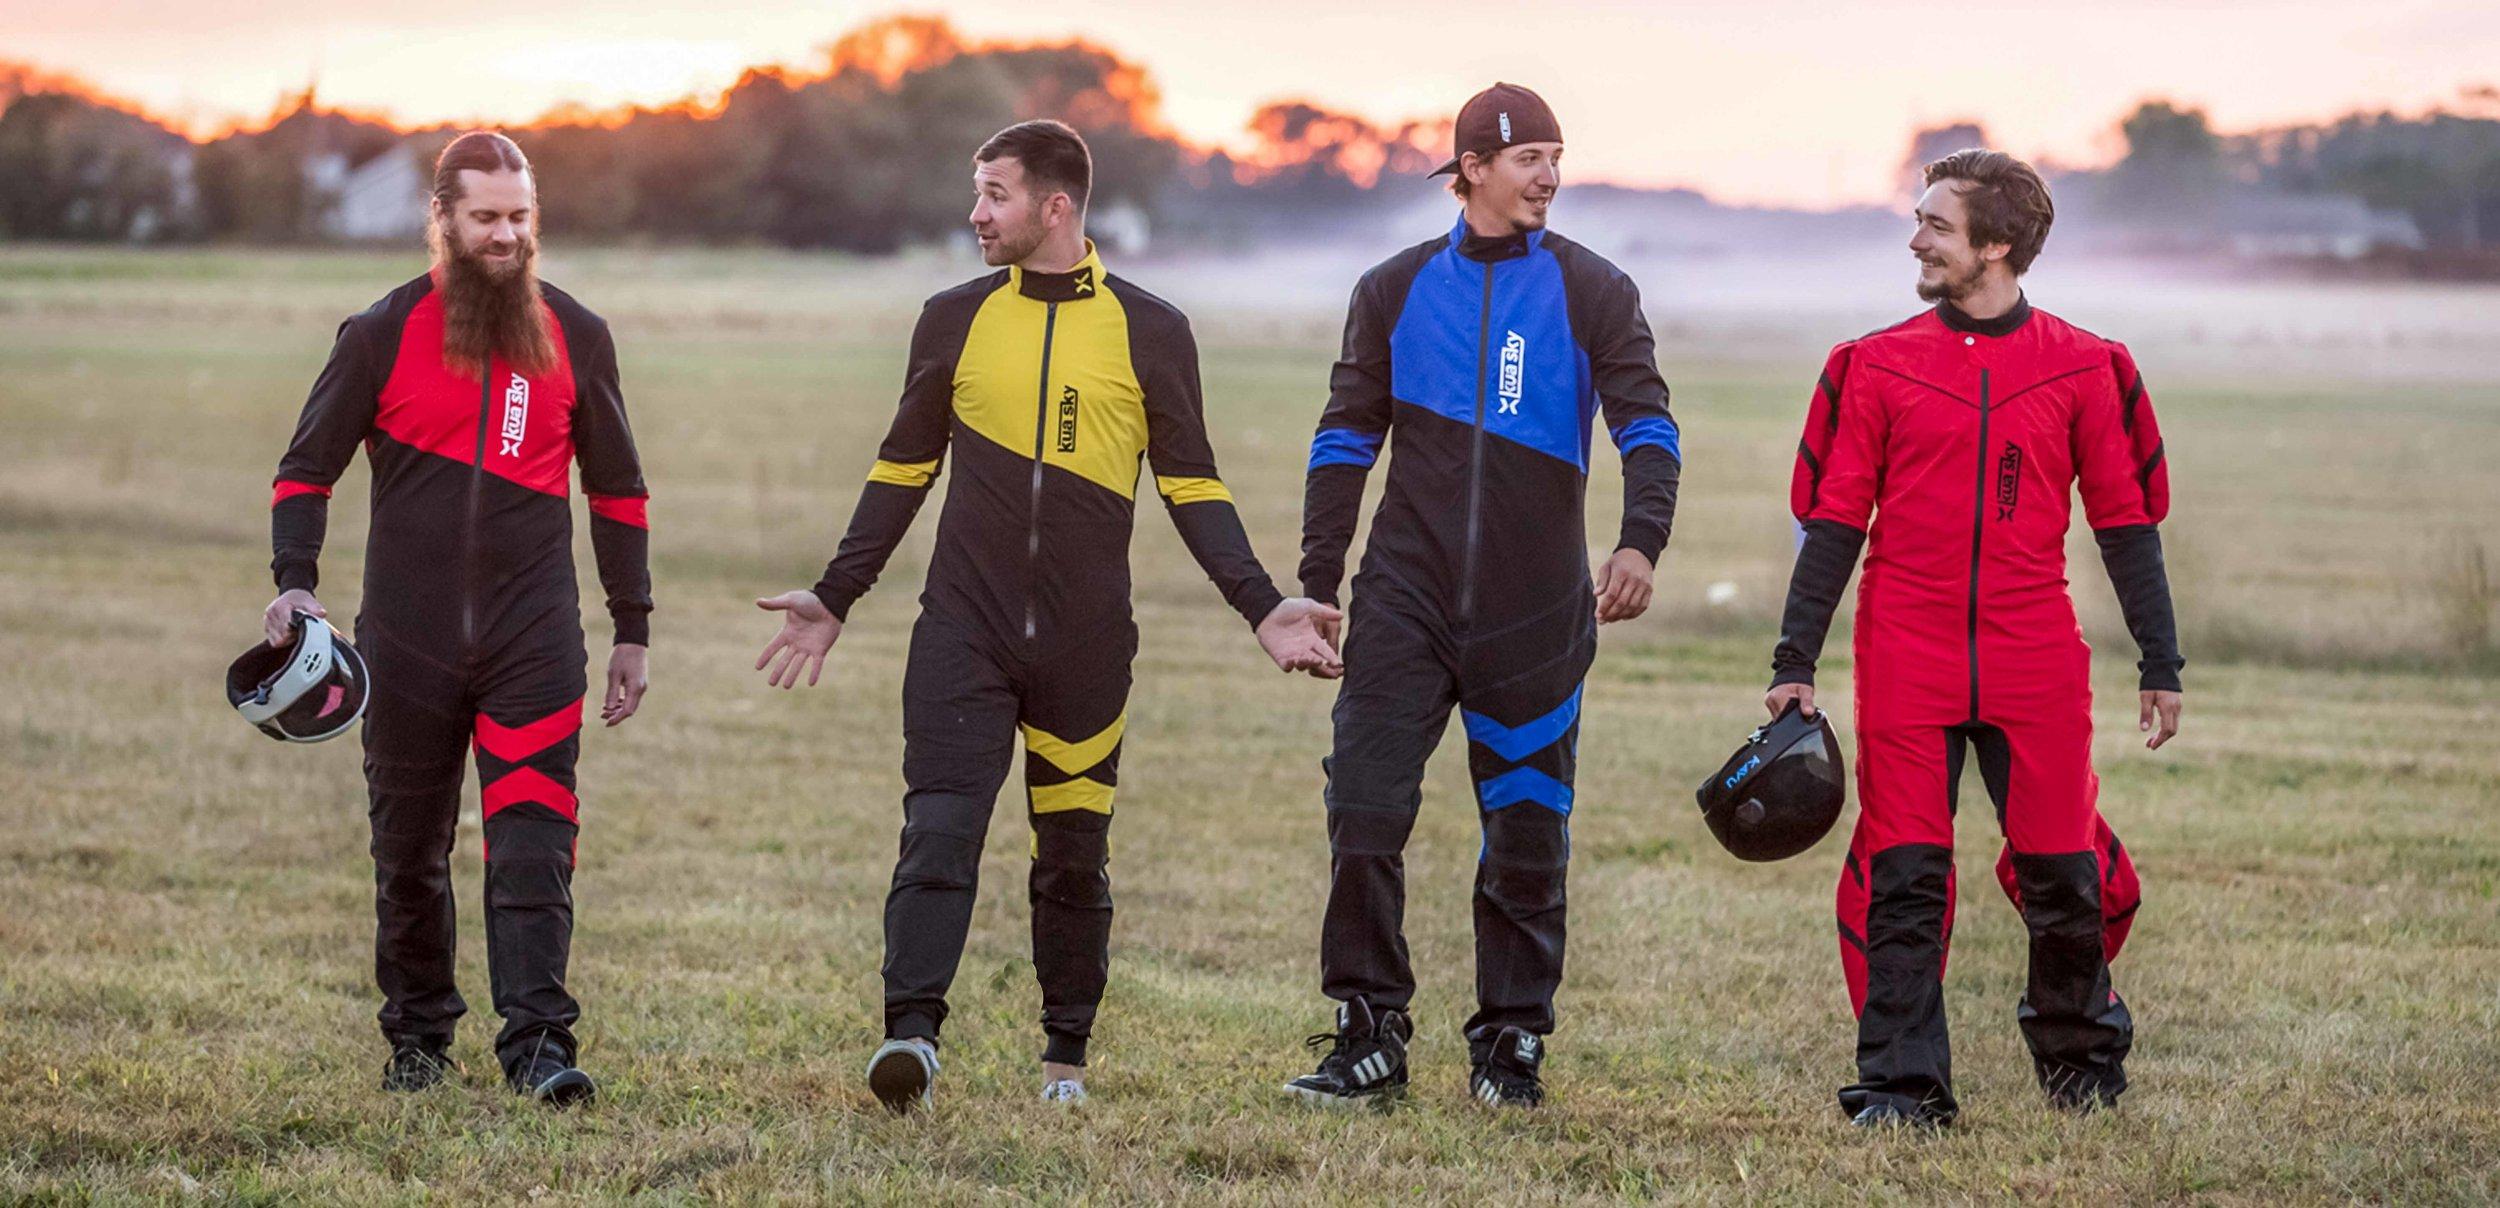 Kua Sky Jumpsuits Group Men.jpg